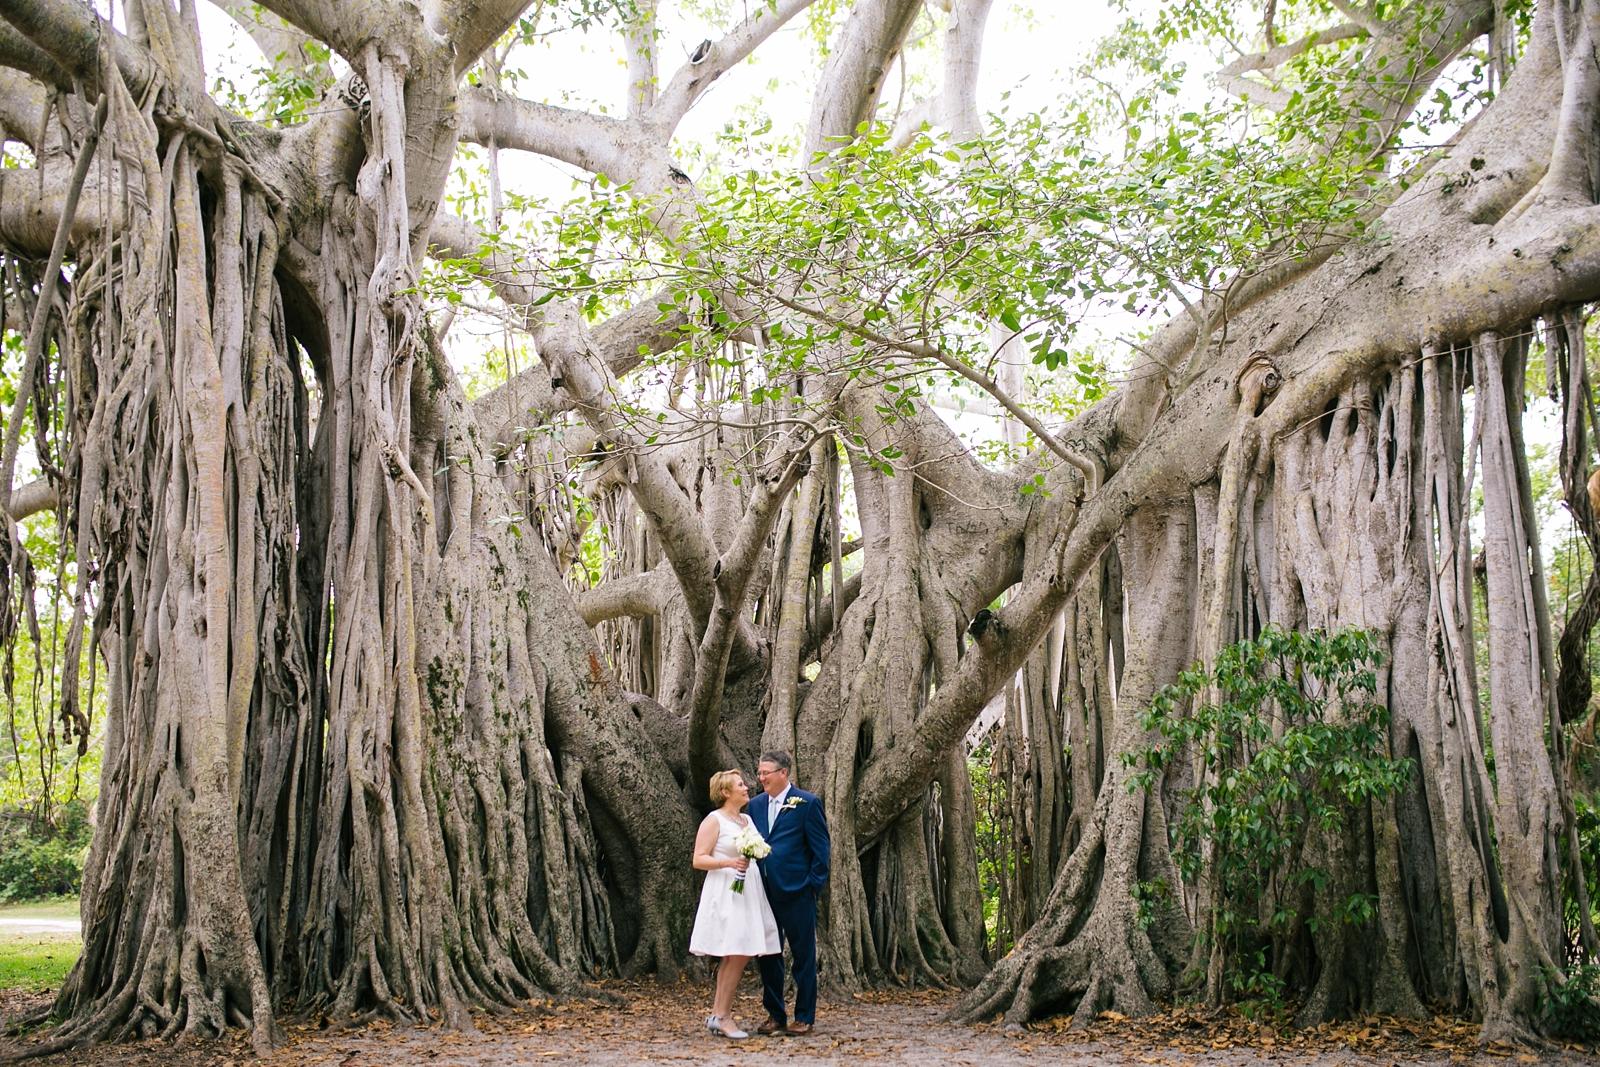 16-los-angeles-wedding-photographer-fort-lauderdale.jpg